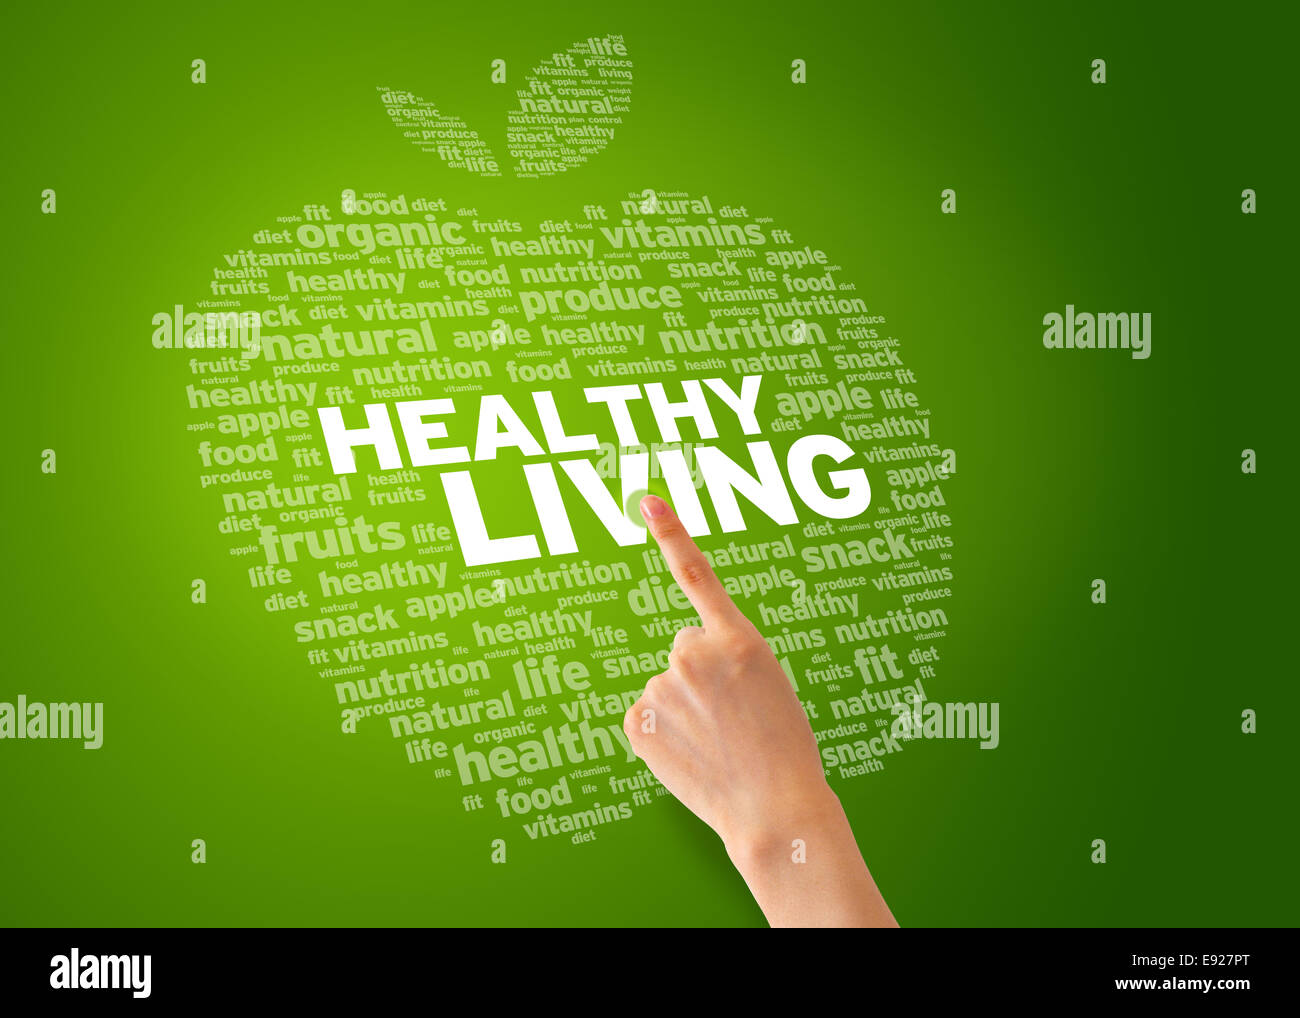 Healhty Living - Stock Image